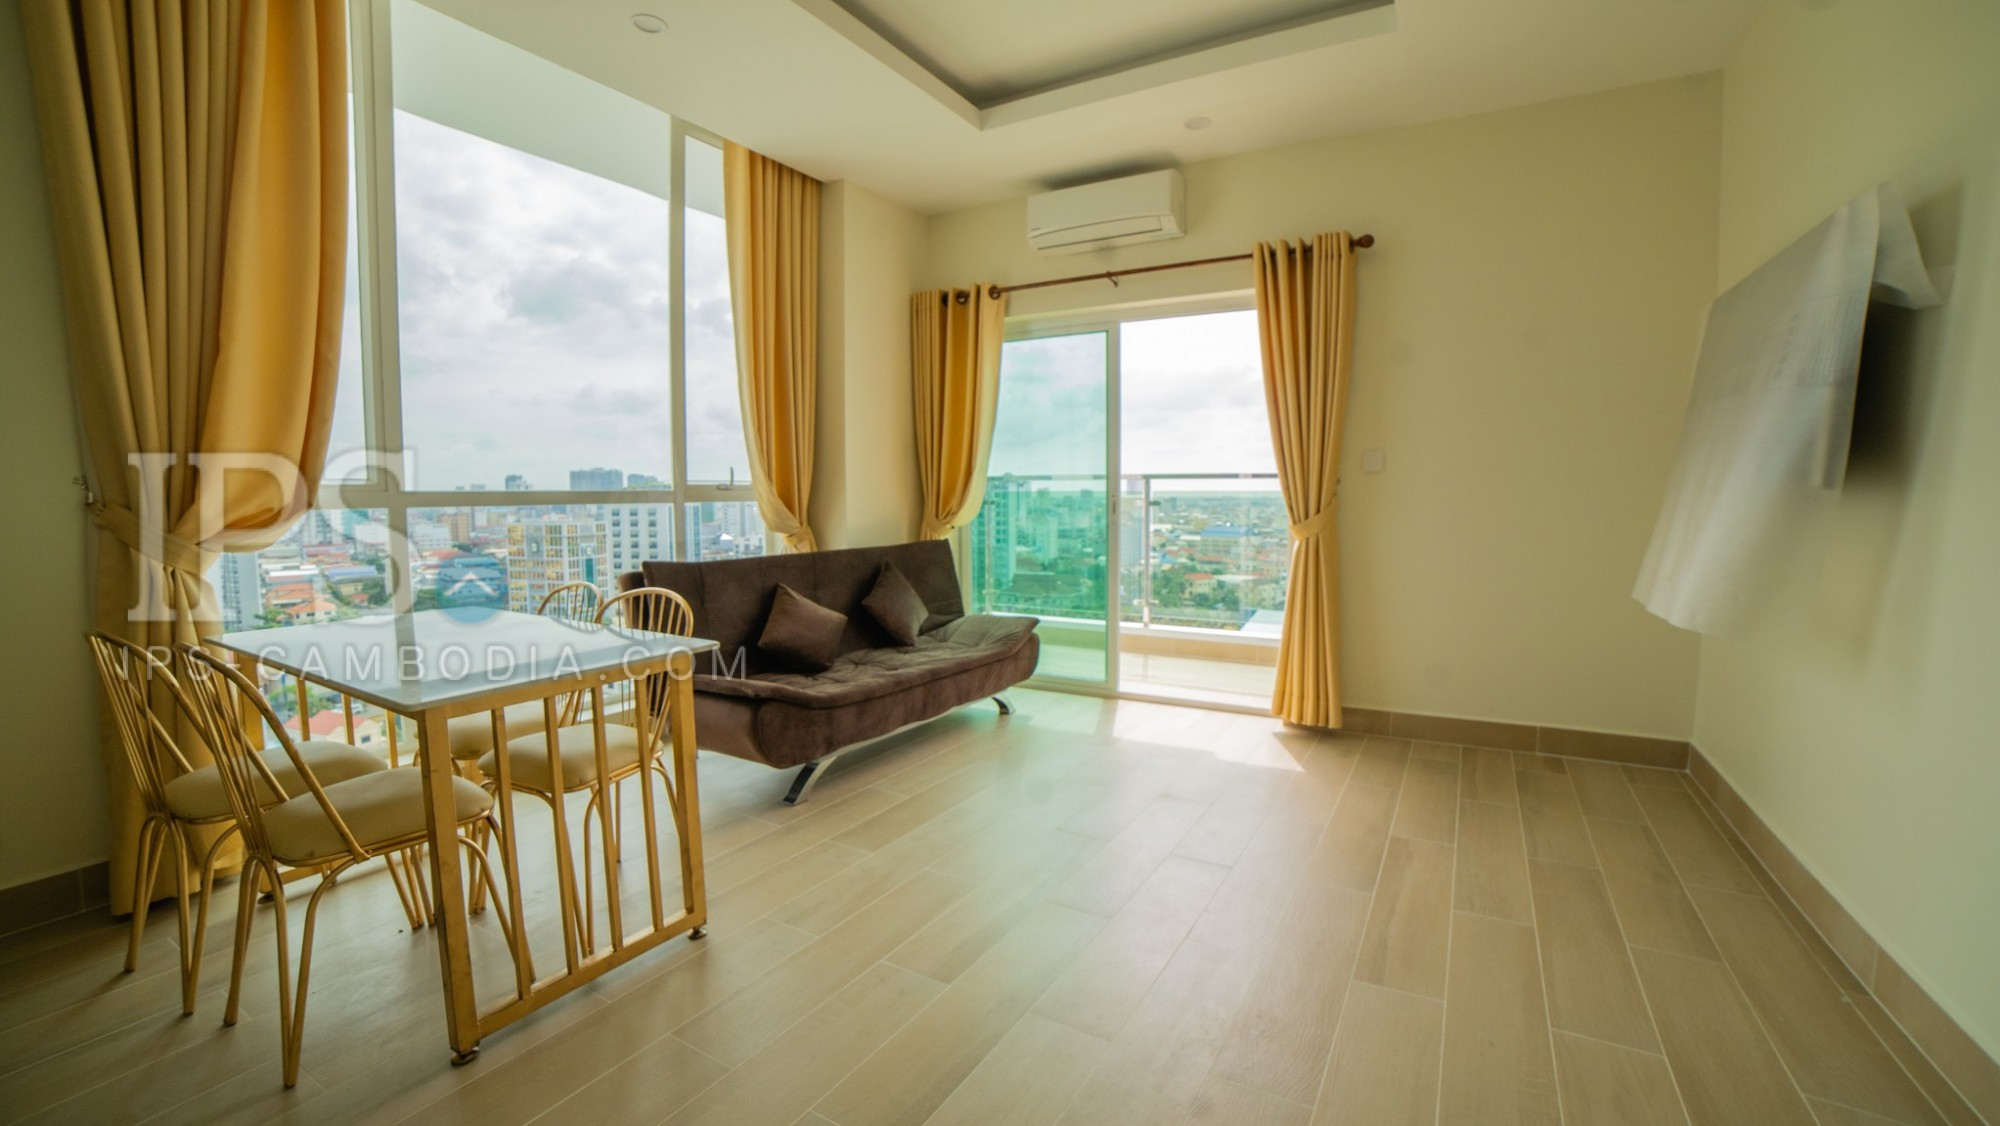 2 Bedroom Apartment For Rent - Boeng Tumpun, Phnom Penh